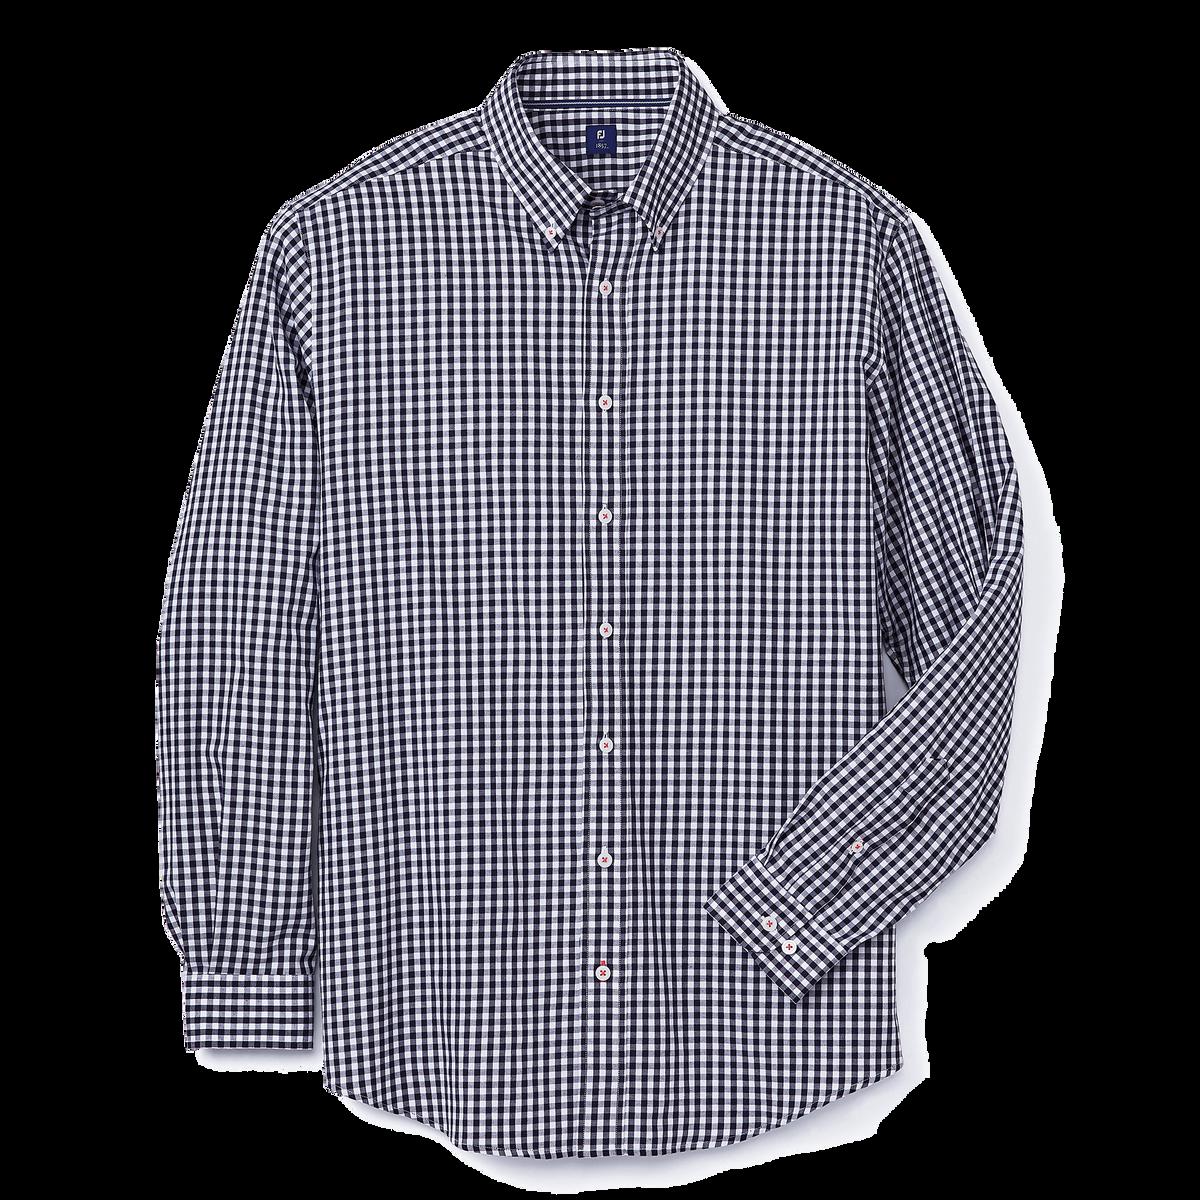 Brushed Gingham Woven Shirt